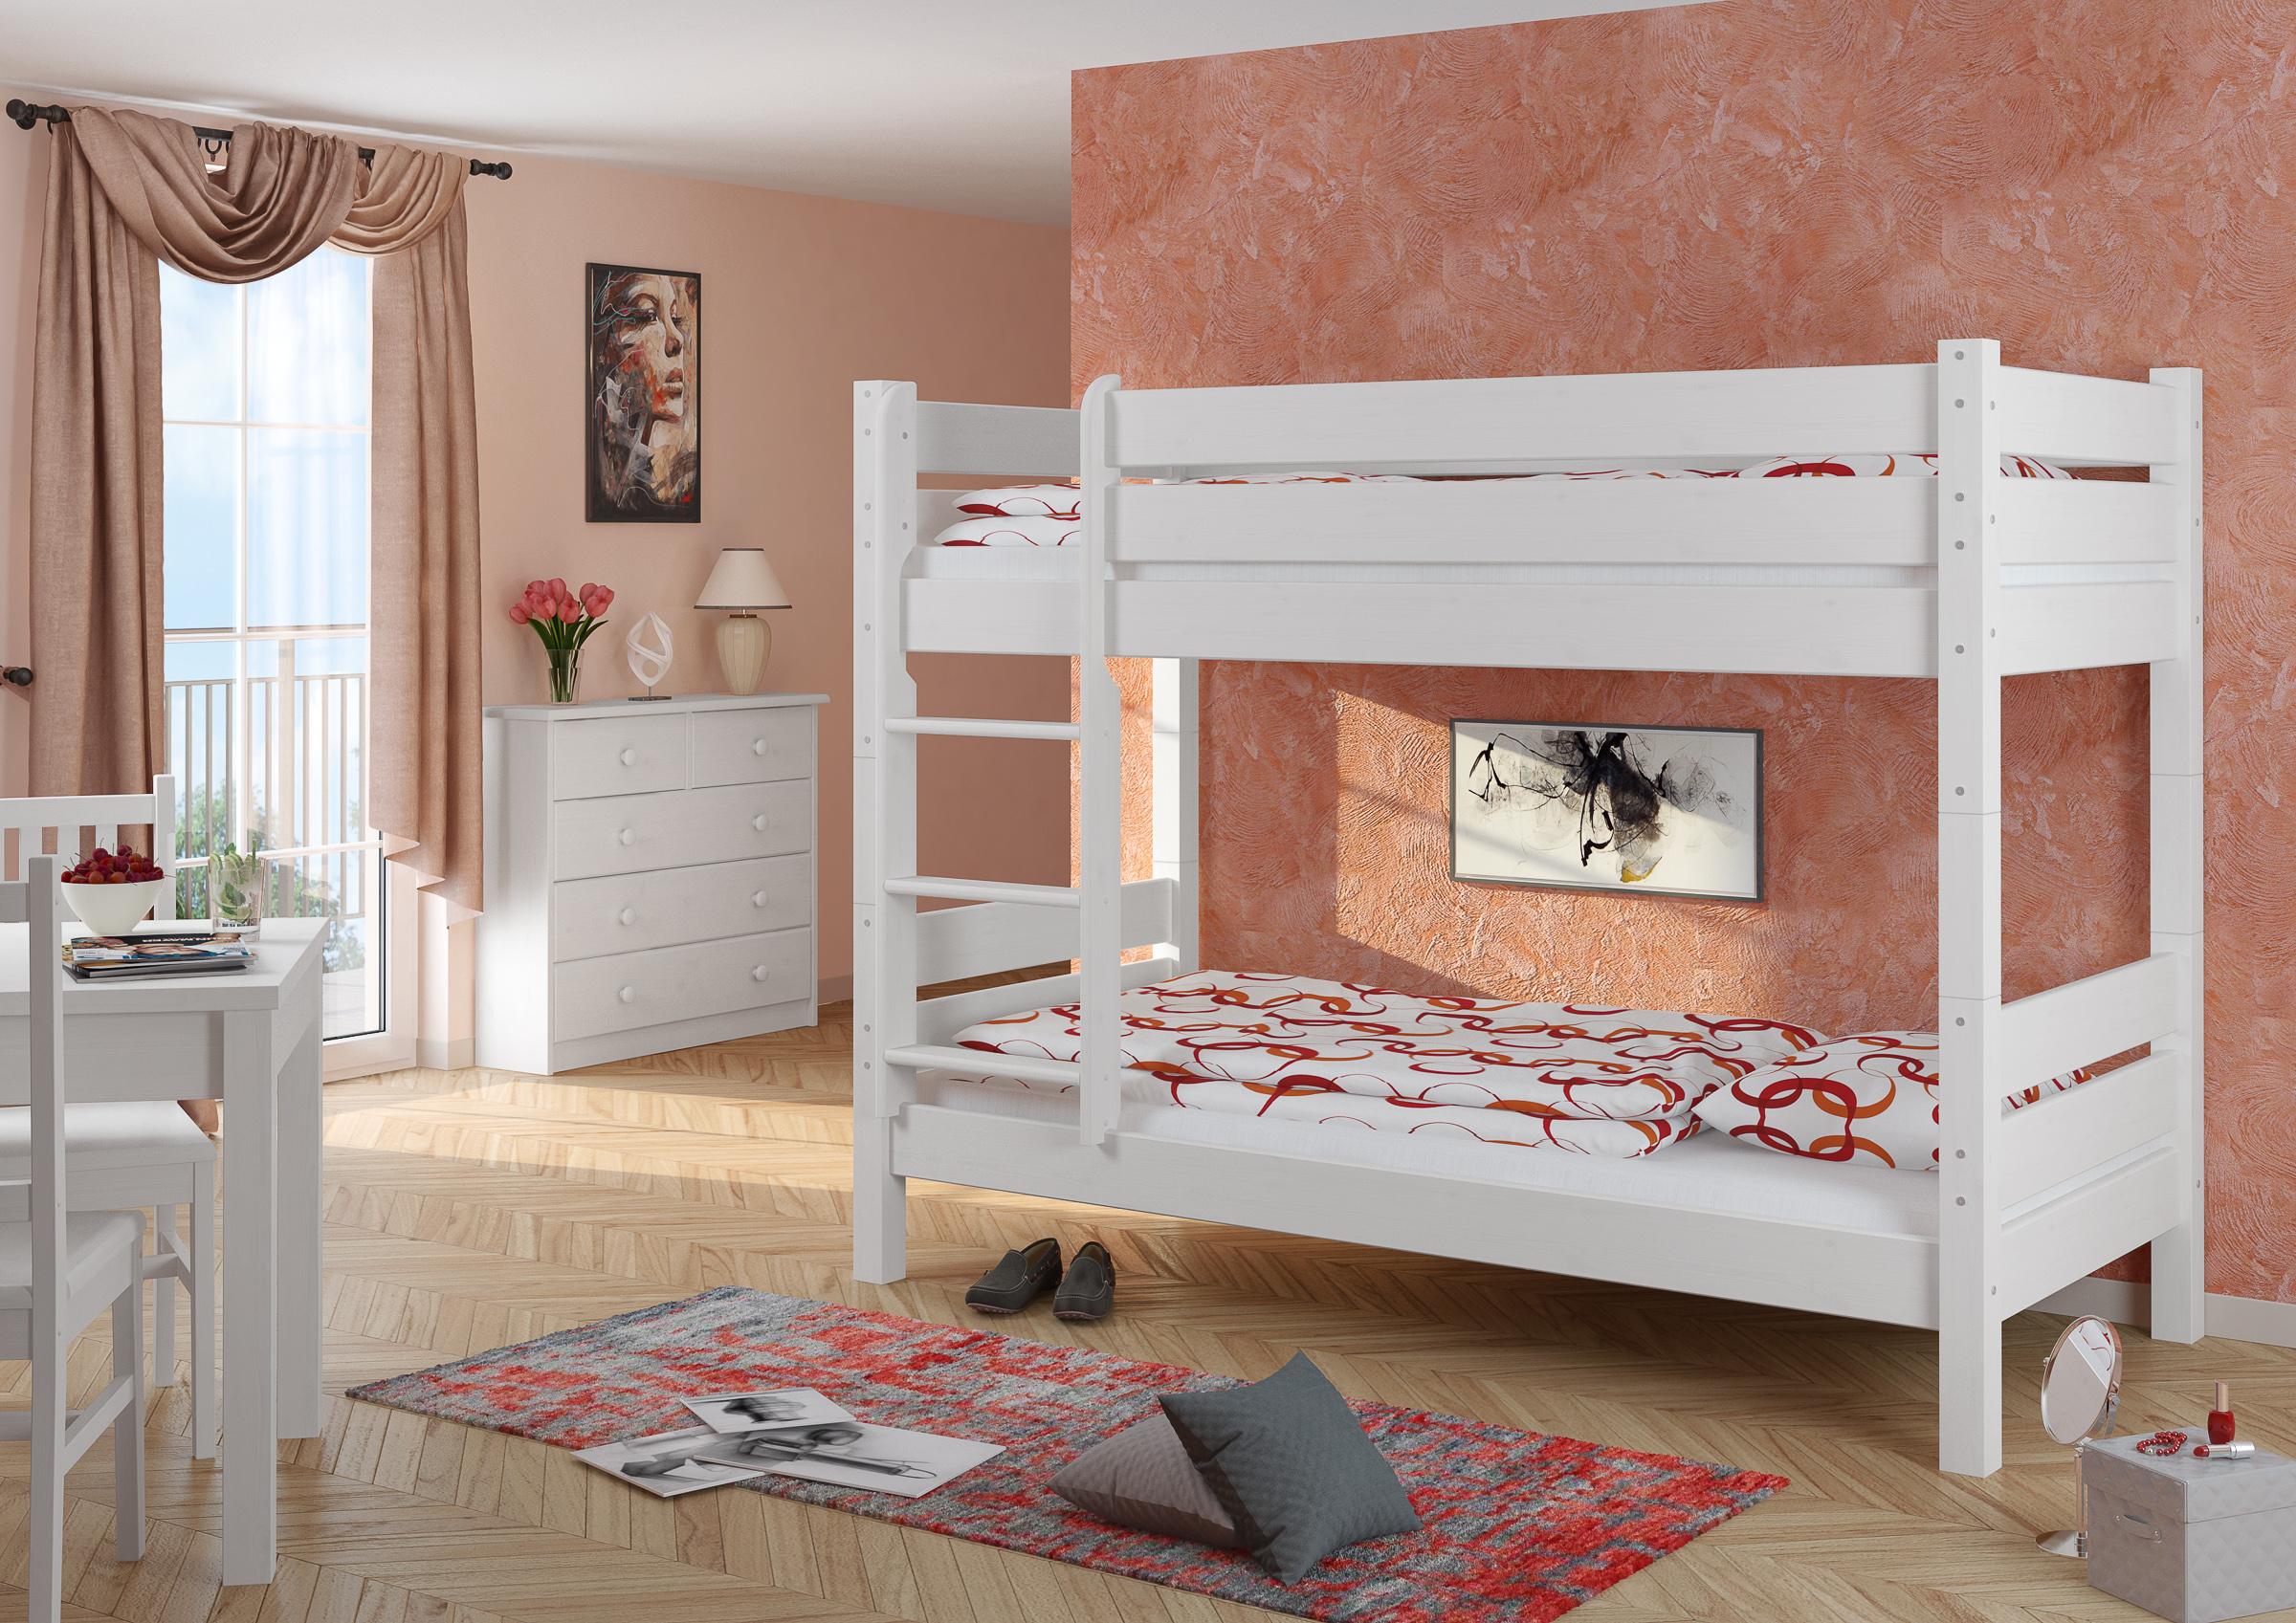 etagenbett hochbett stockbett stabil 90x200 teilbar 2 rollroste w t100 4250639504950 ebay. Black Bedroom Furniture Sets. Home Design Ideas